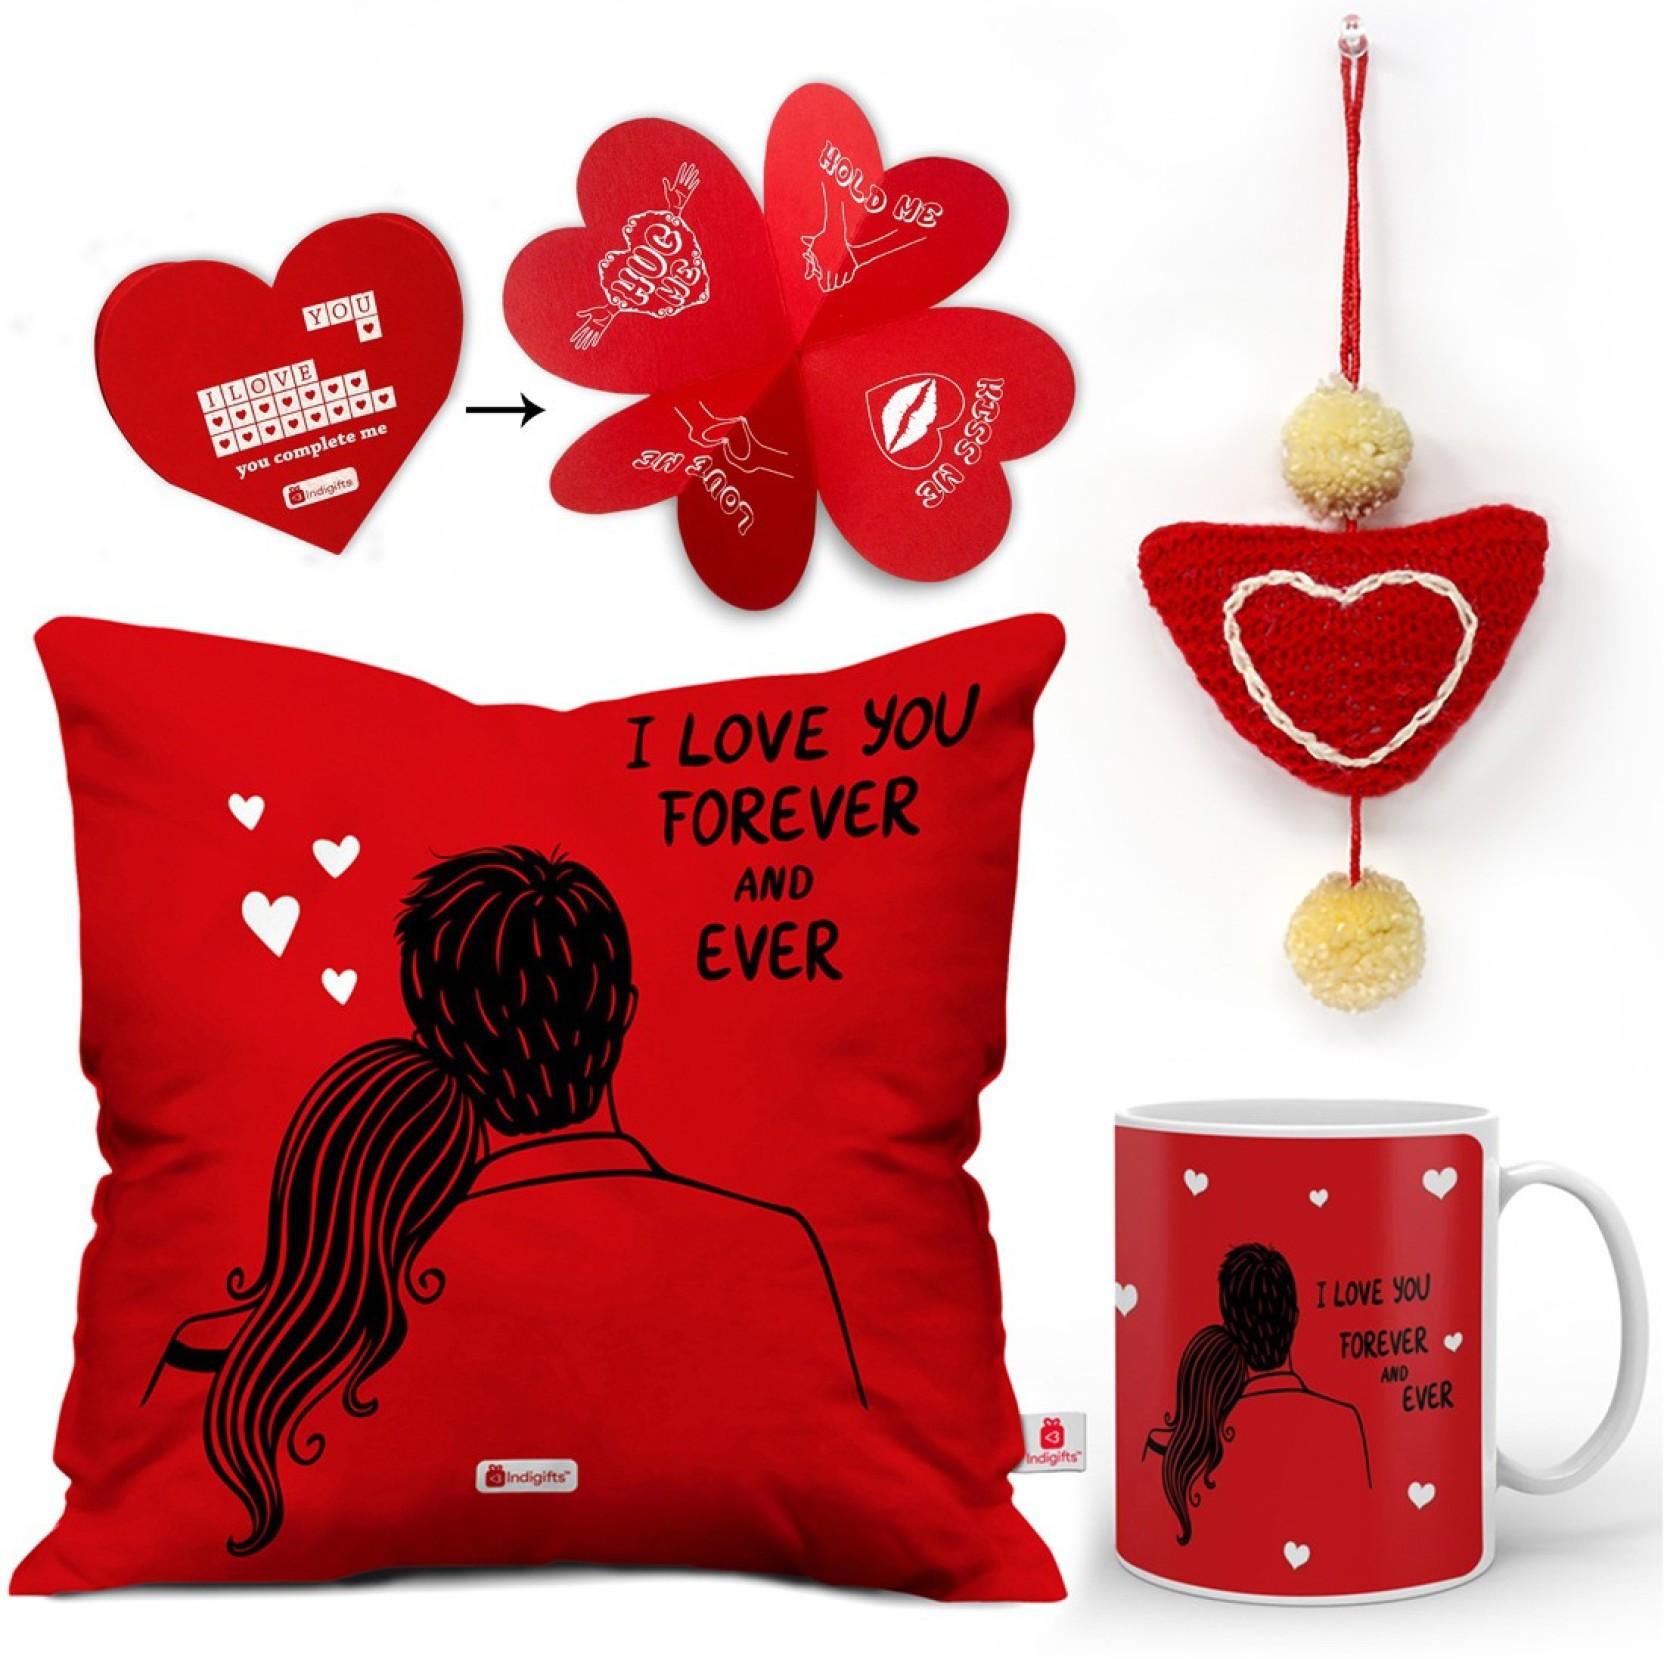 Indi ts Love Gift 0D 0CM066 0LOV Y16 D025 Cushion Mug Showpiece